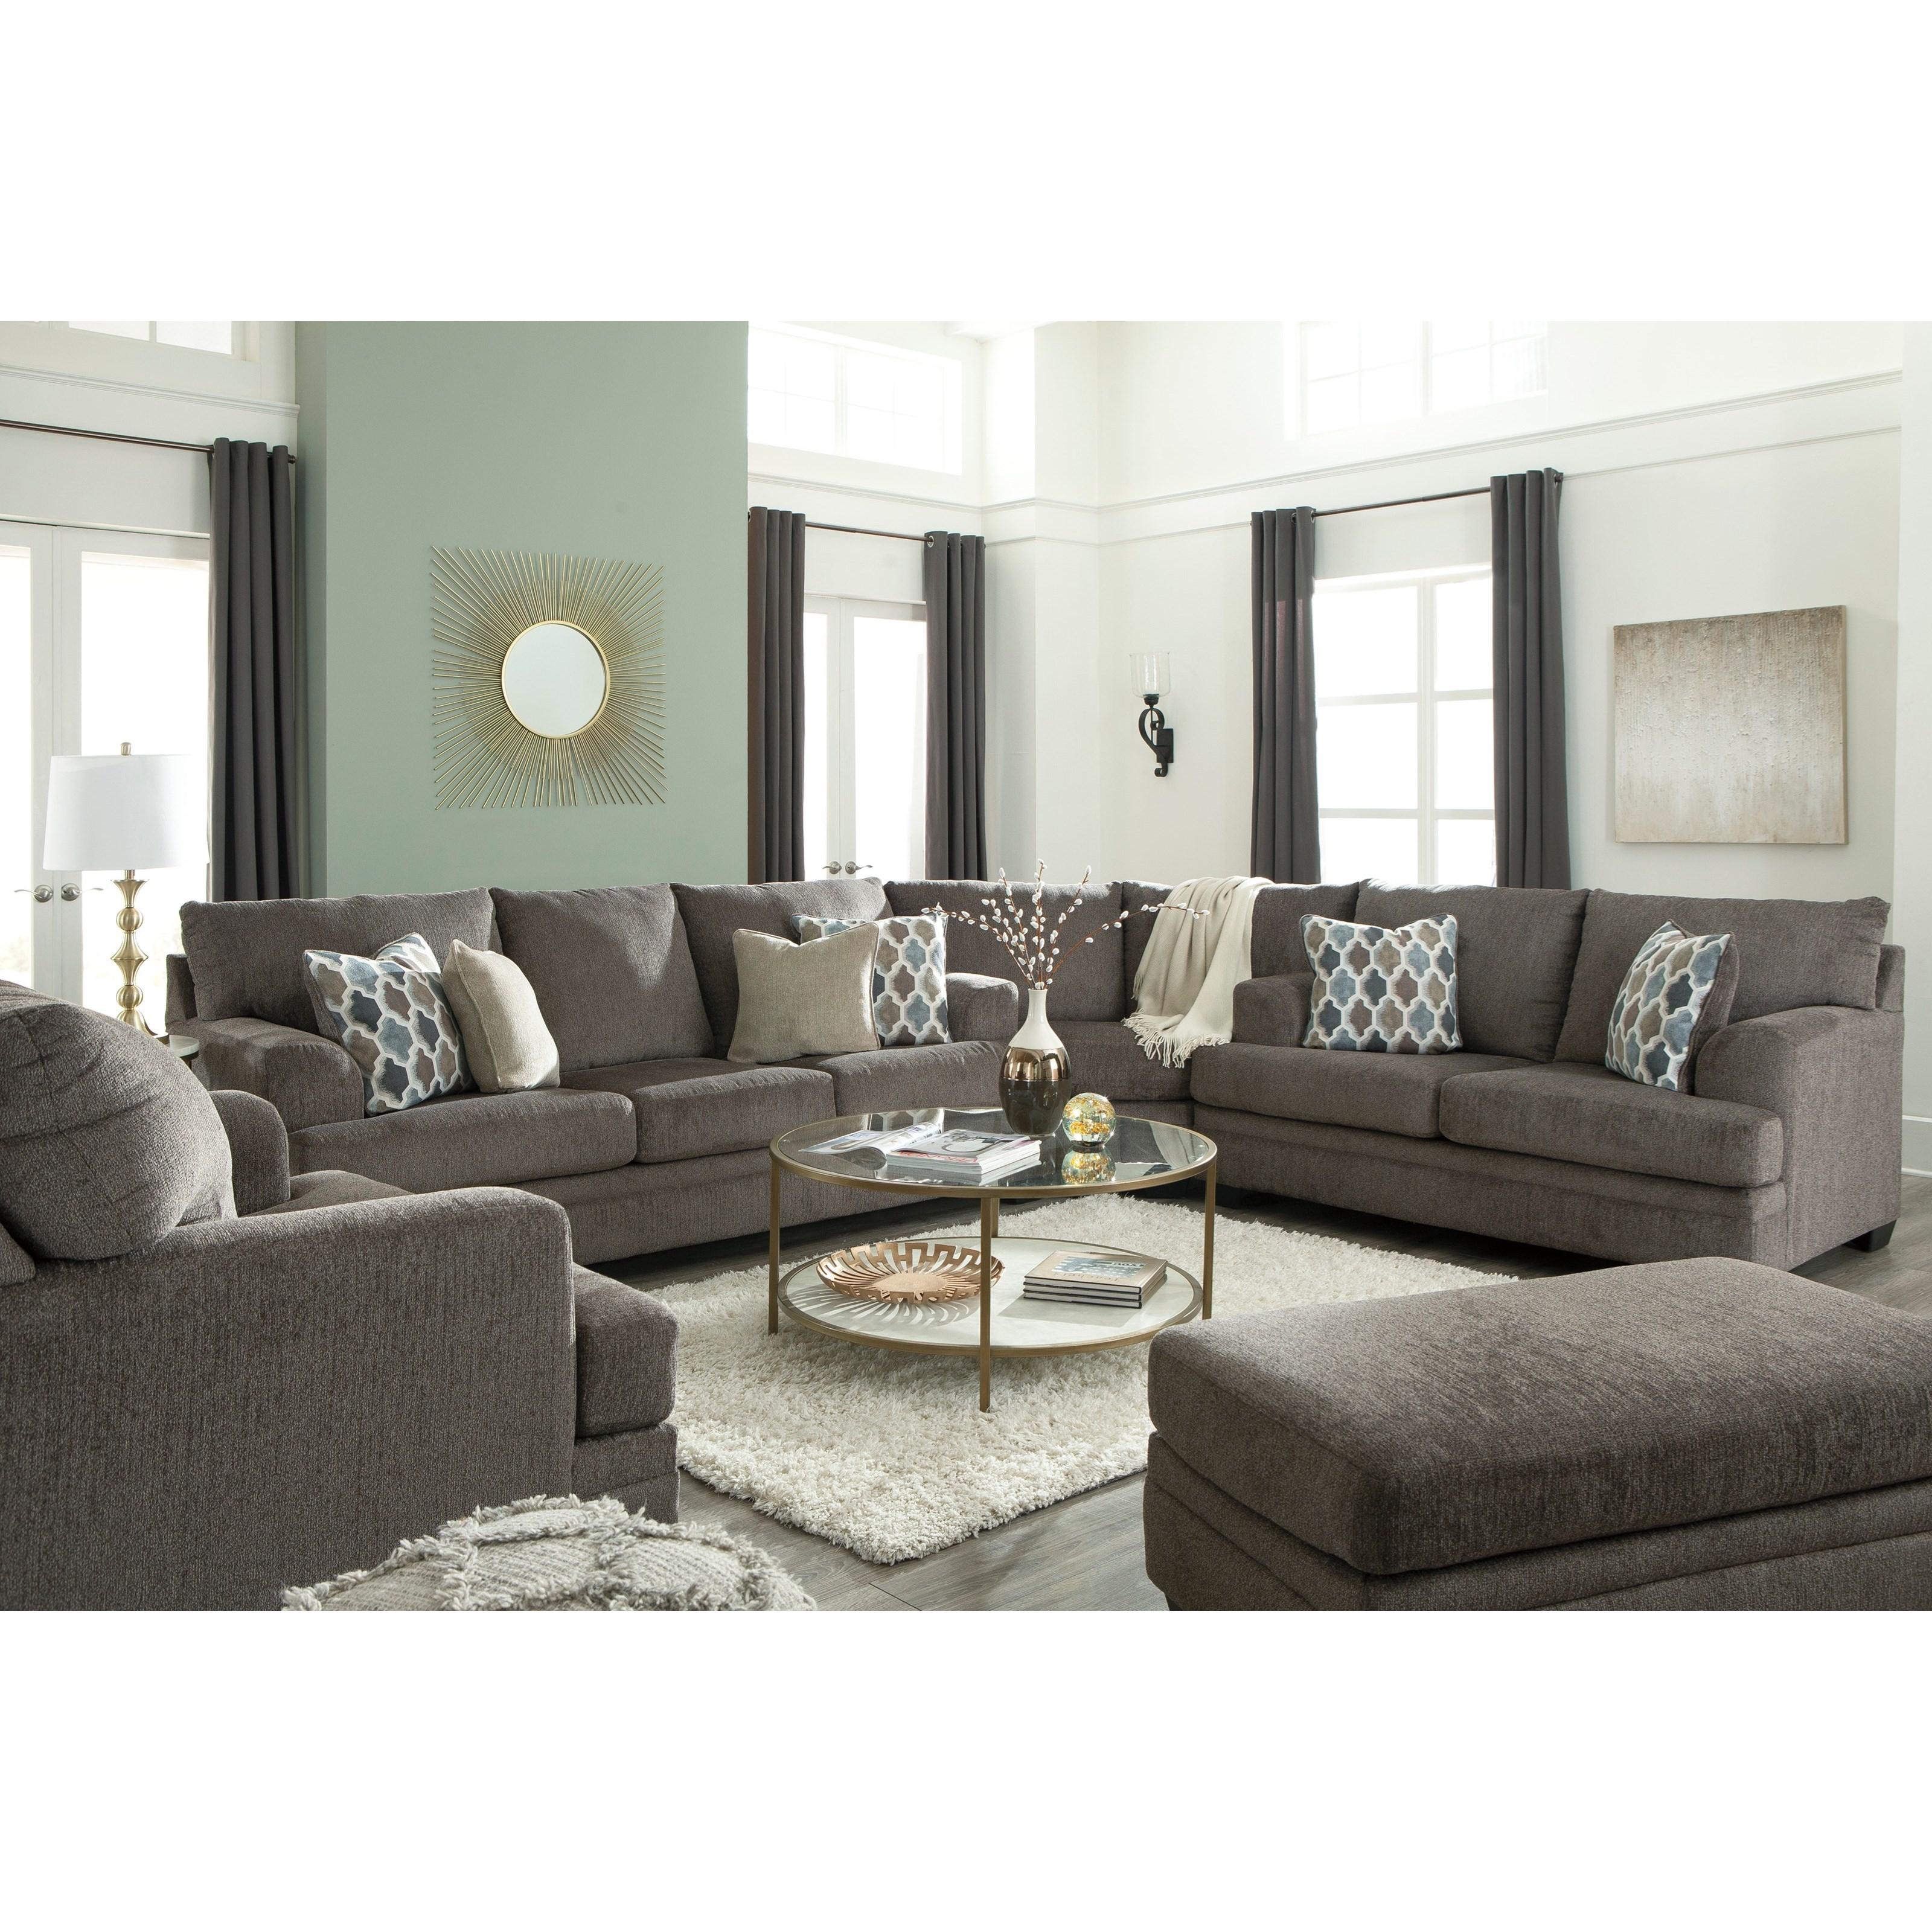 Dorsten Stationary Living Room Group by Ashley (Signature Design) at Johnny Janosik